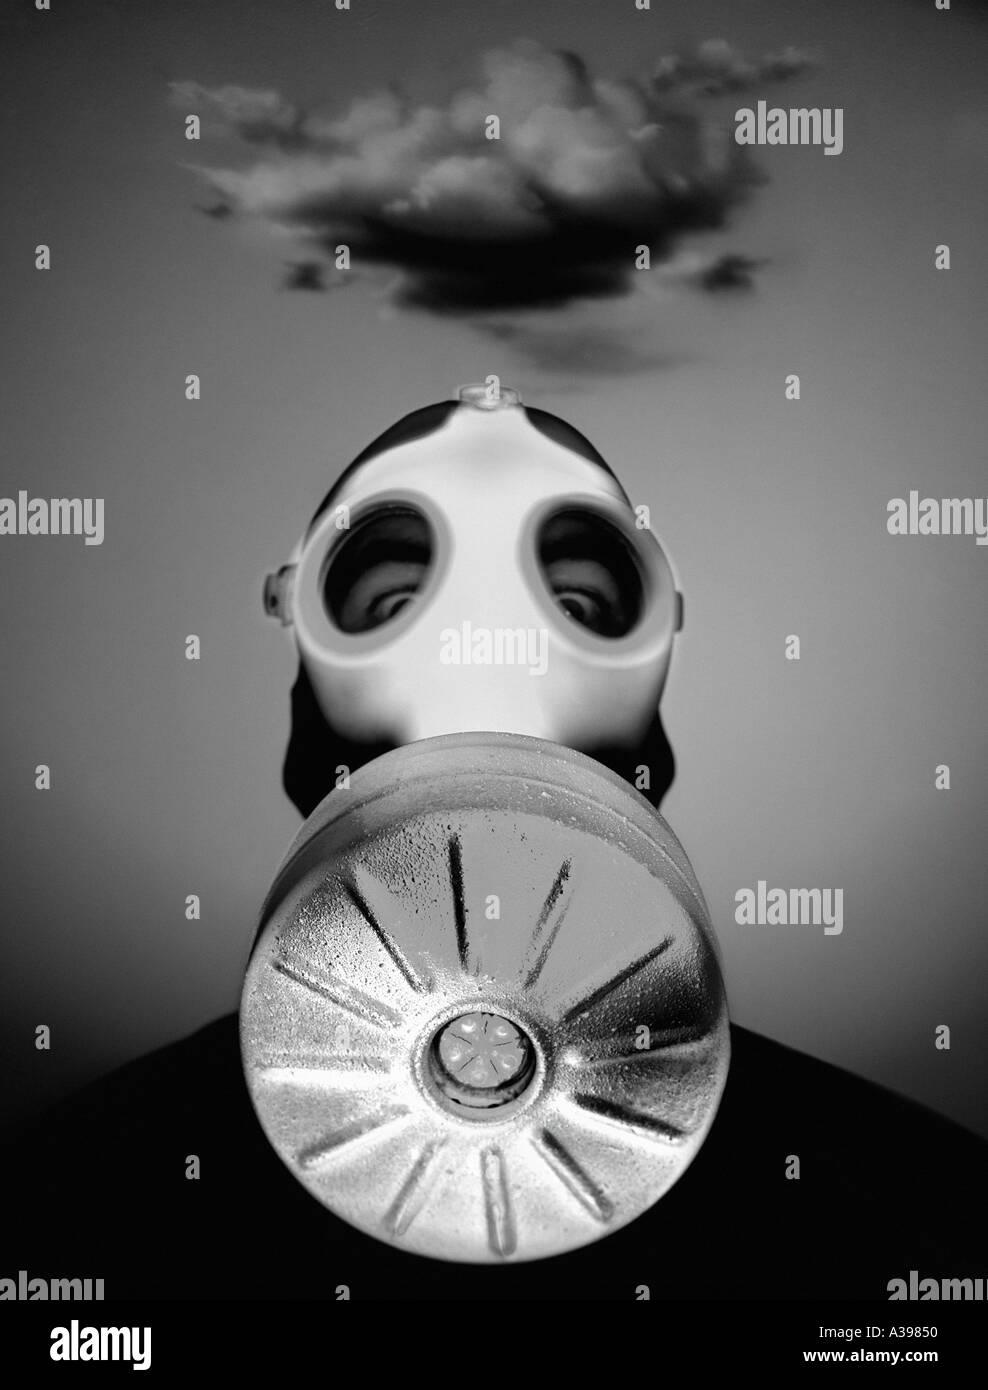 maschera antigas Immagini Stock